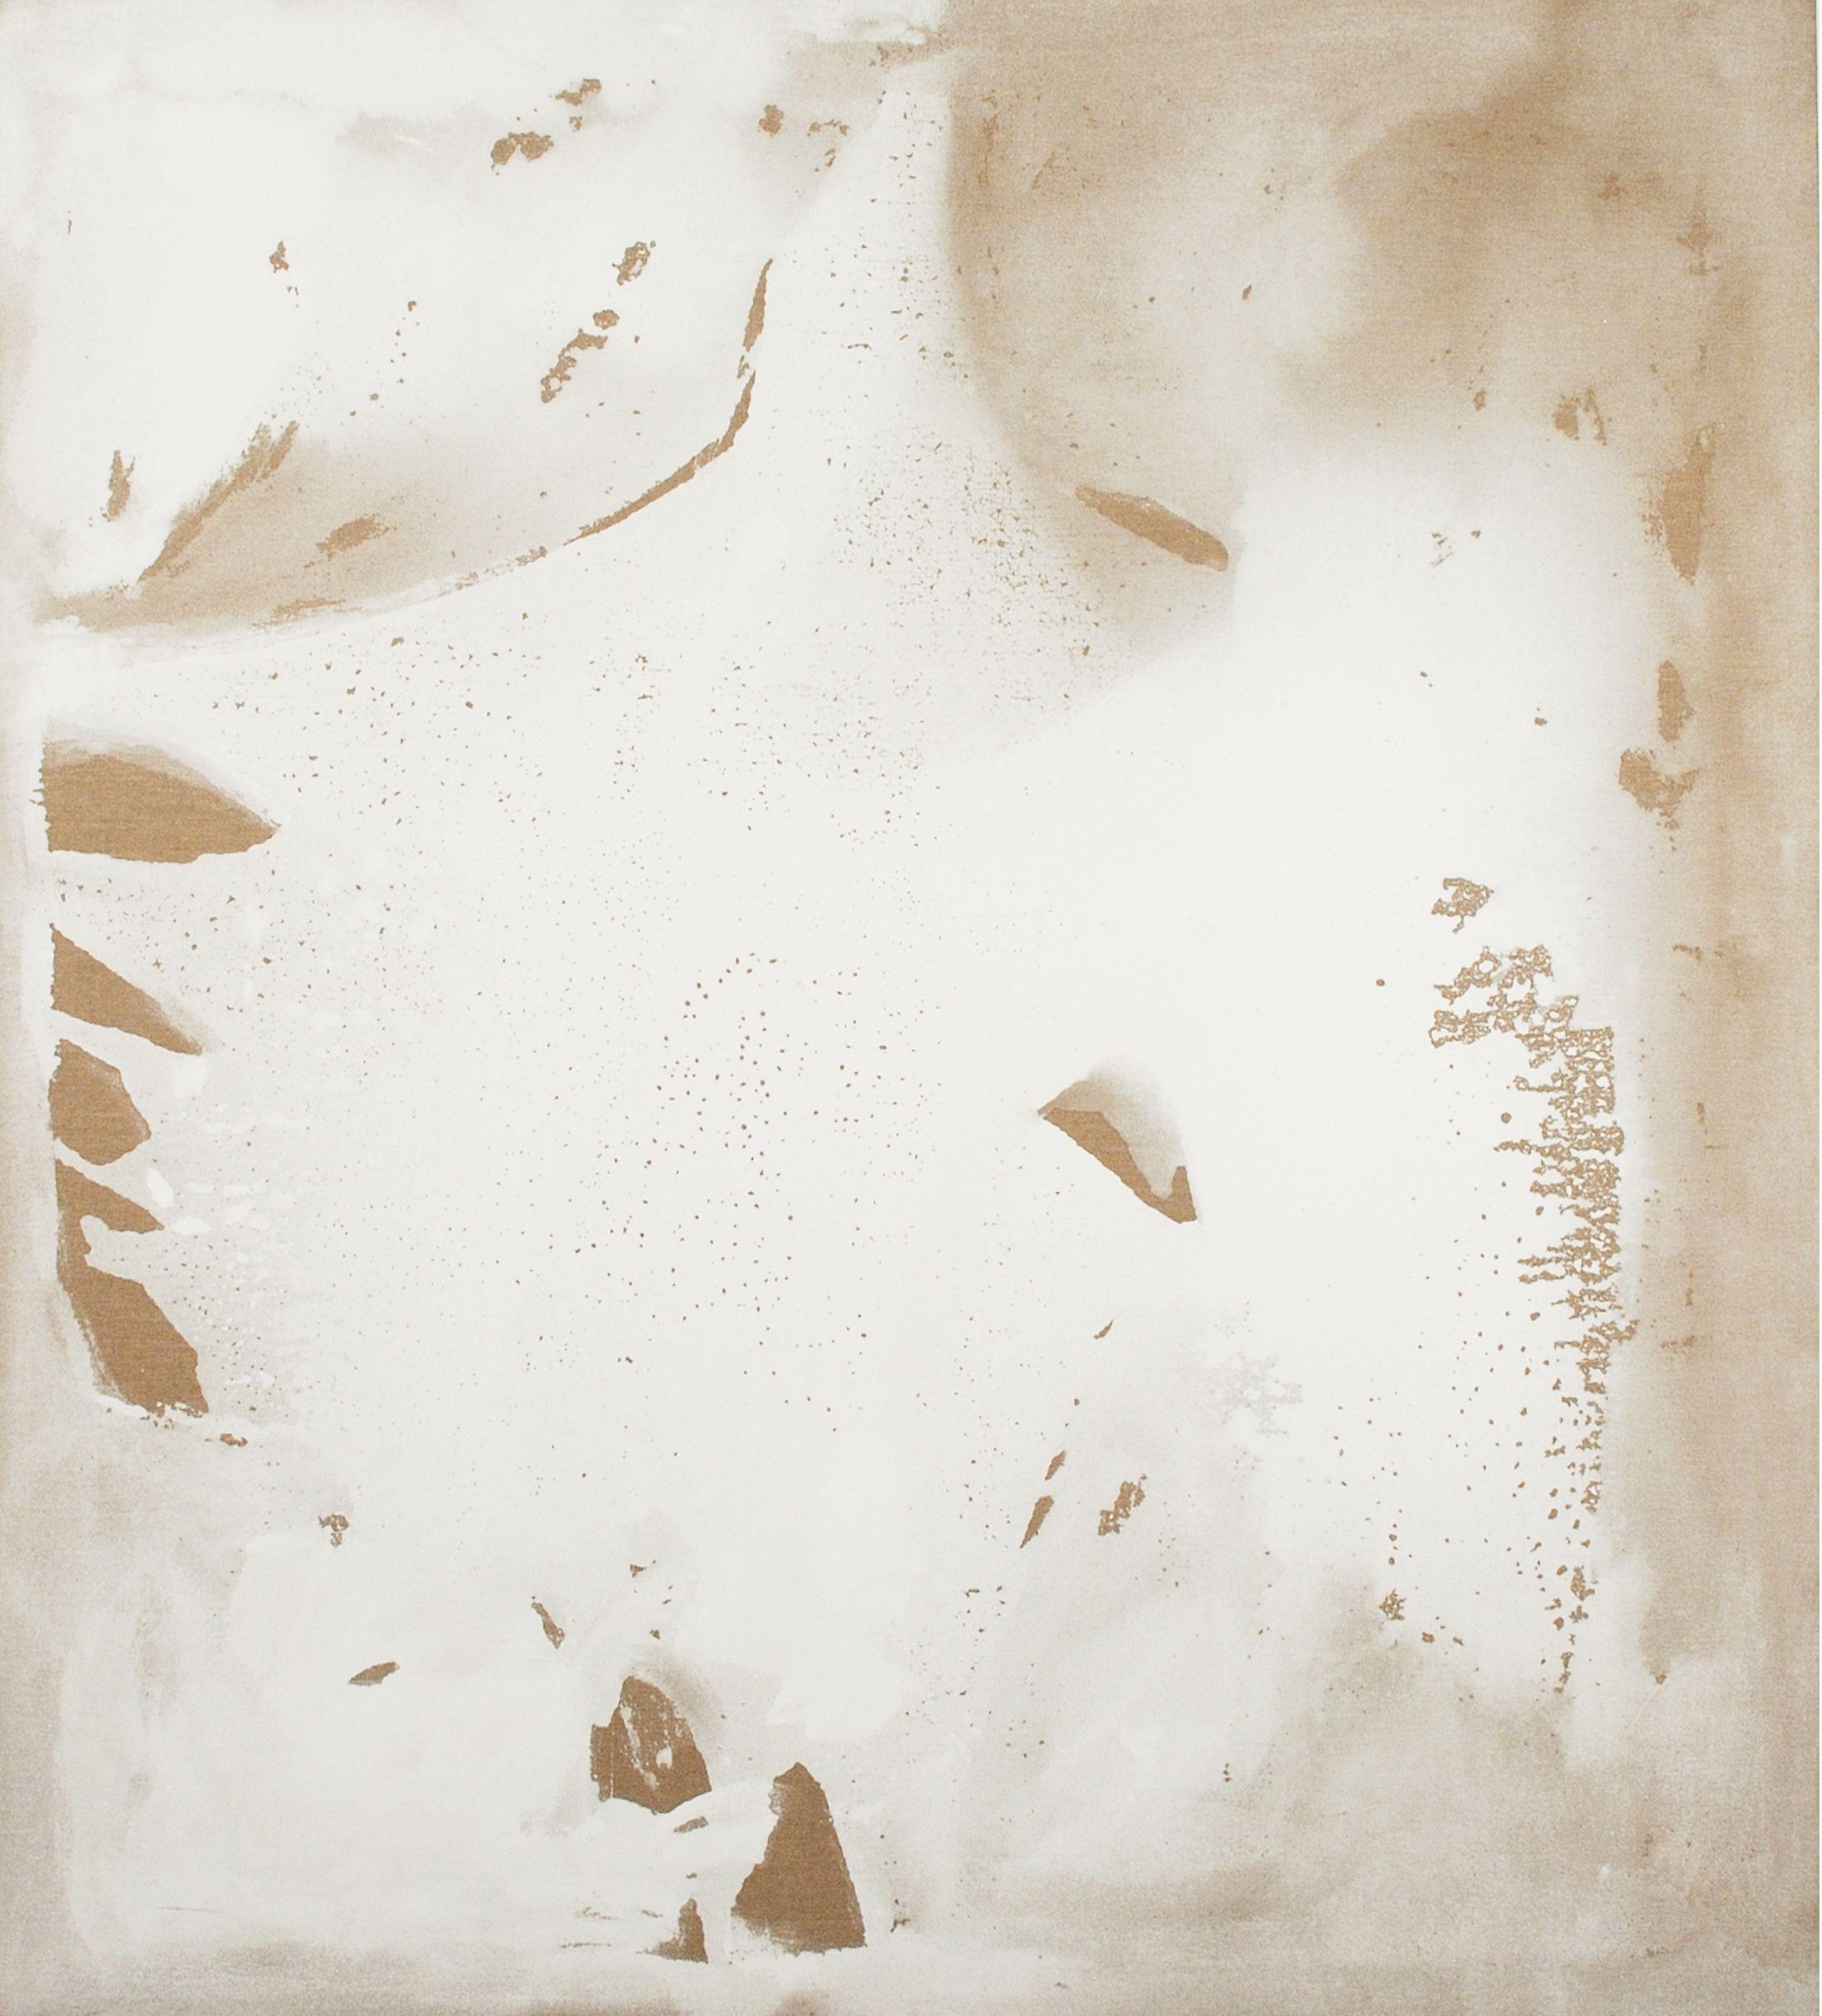 Luce silente, 2002, tempera acrilica su tela, cm 200 x 180  Luce silente (Silent light), 2002, acrylic tempera on canvas, cm 200 x 180